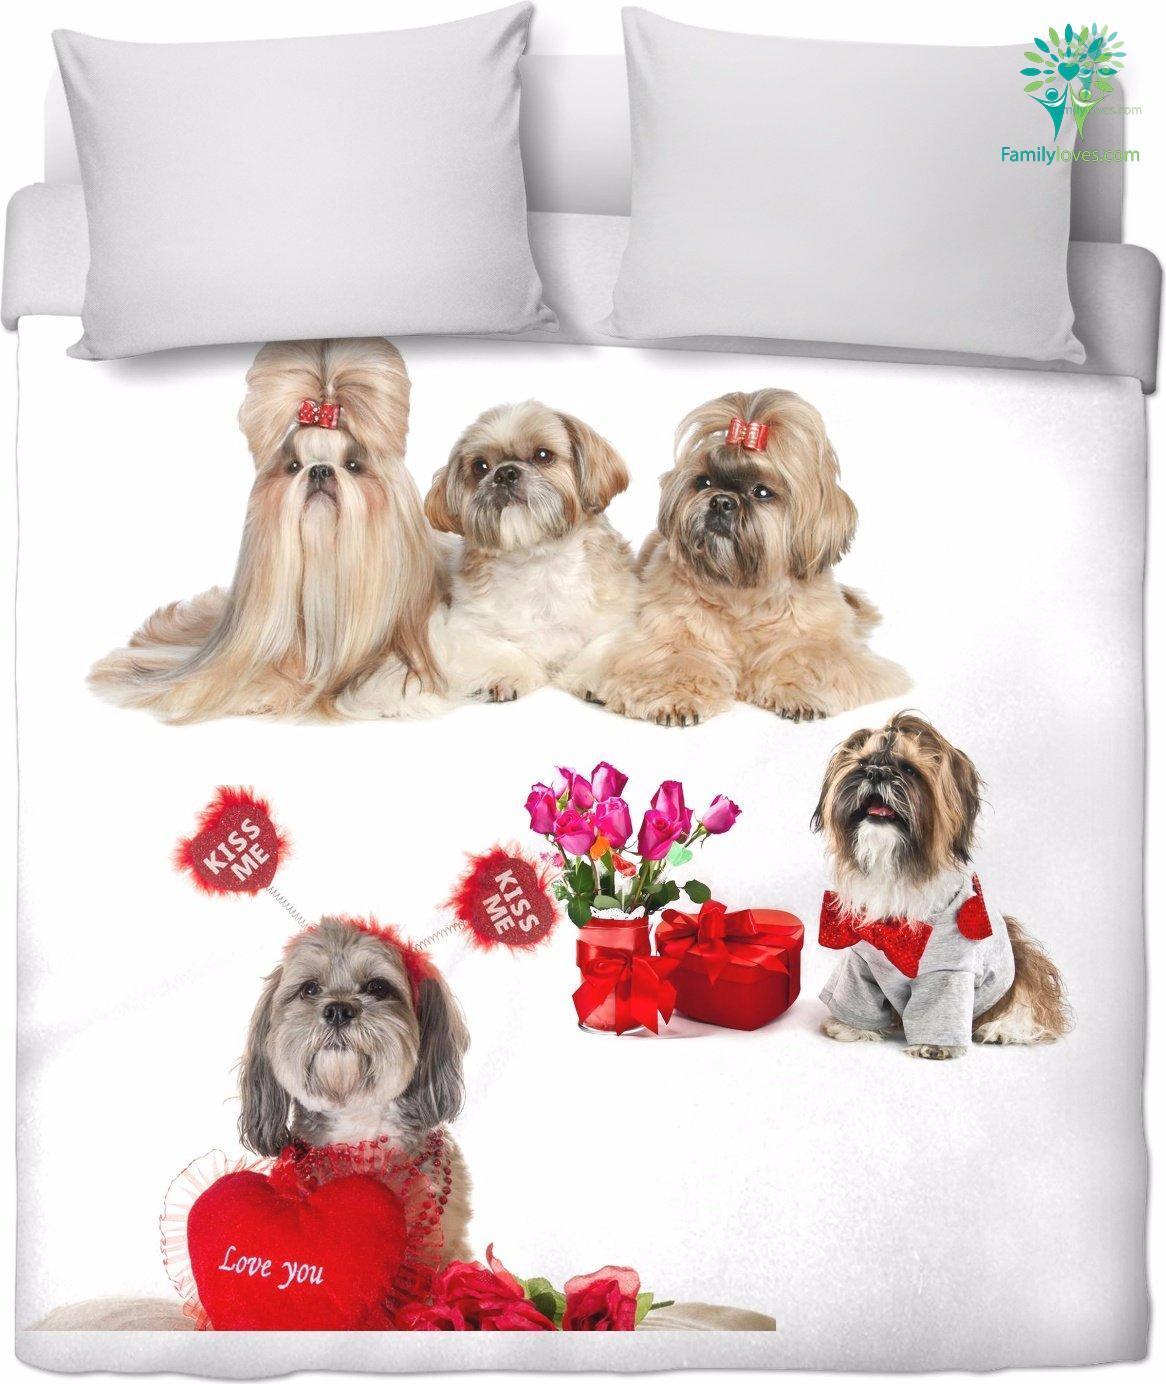 Shih tzu bedding sheet duvet cover handmade and made on-demand Familyloves.com